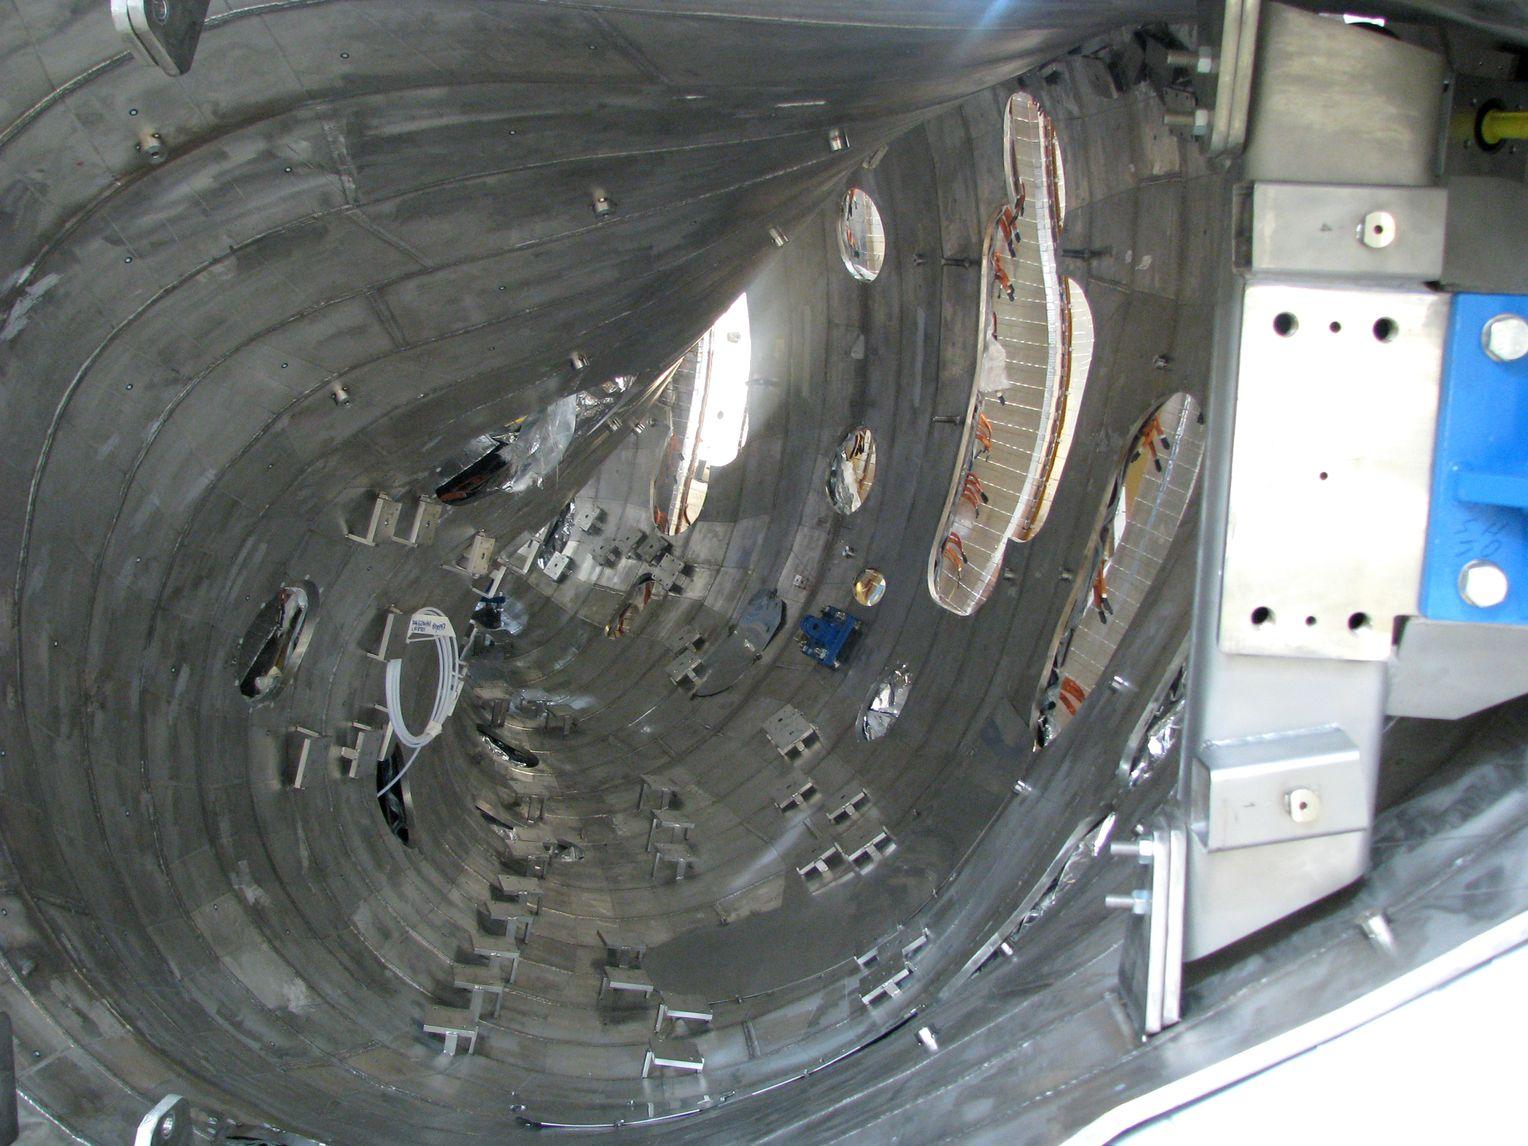 Lockheed Martin Kernfusion